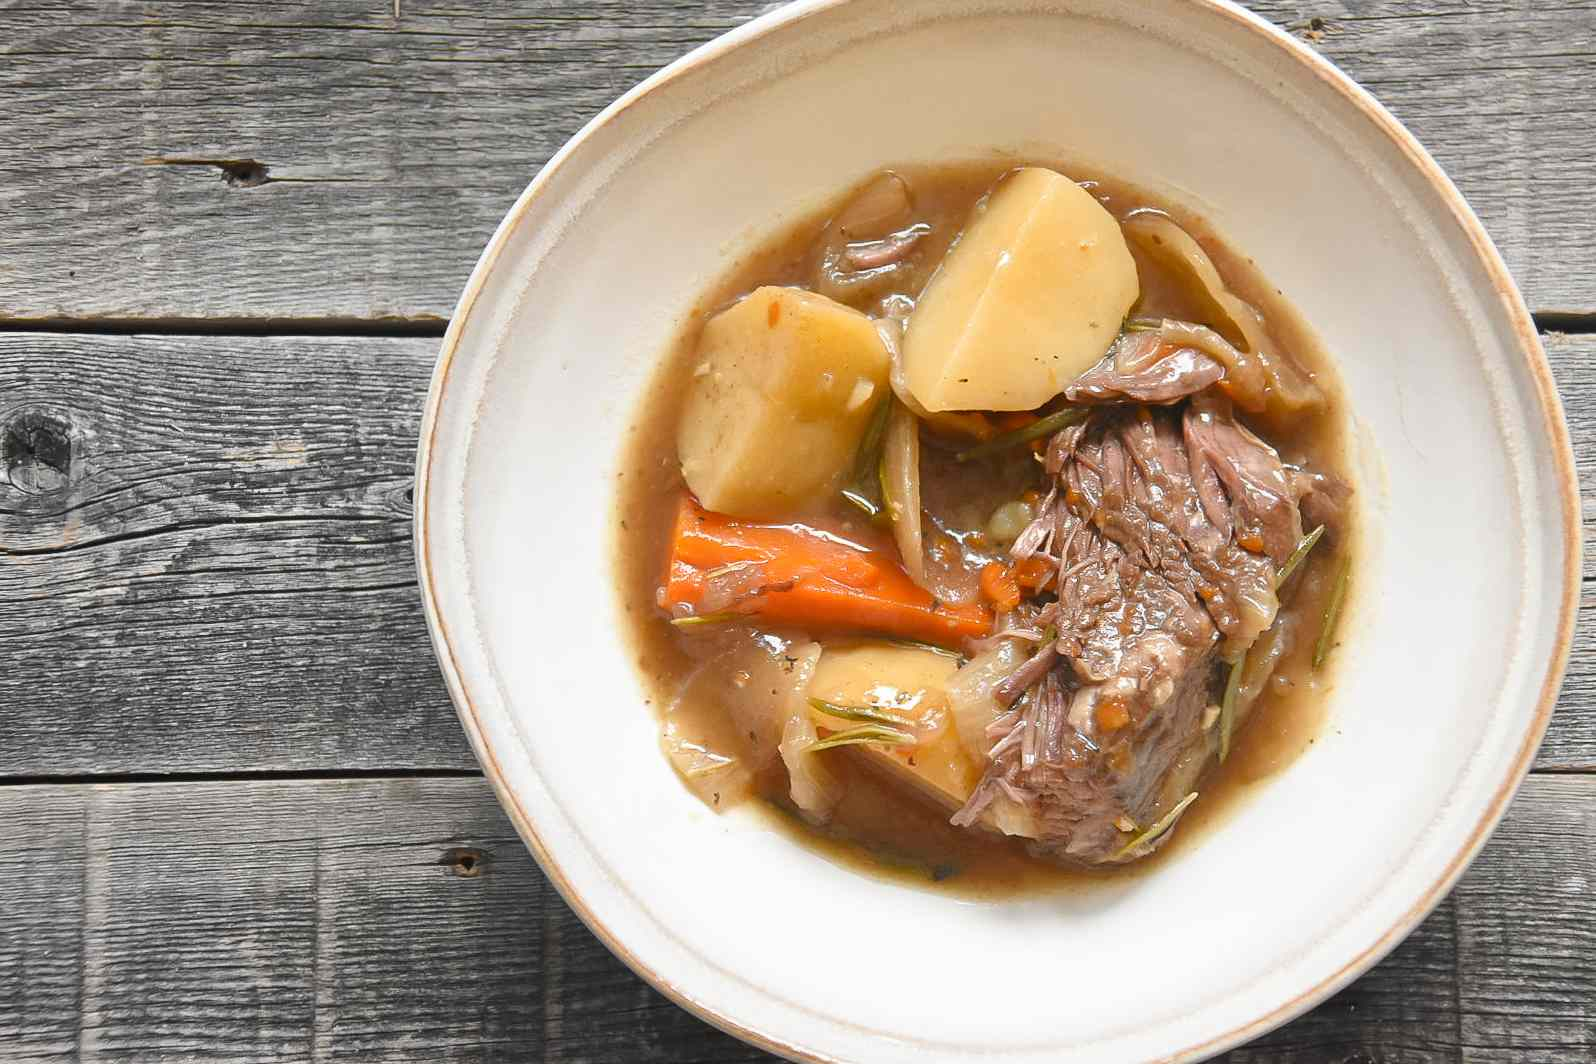 Southern Pot Roast recipe, on a plate